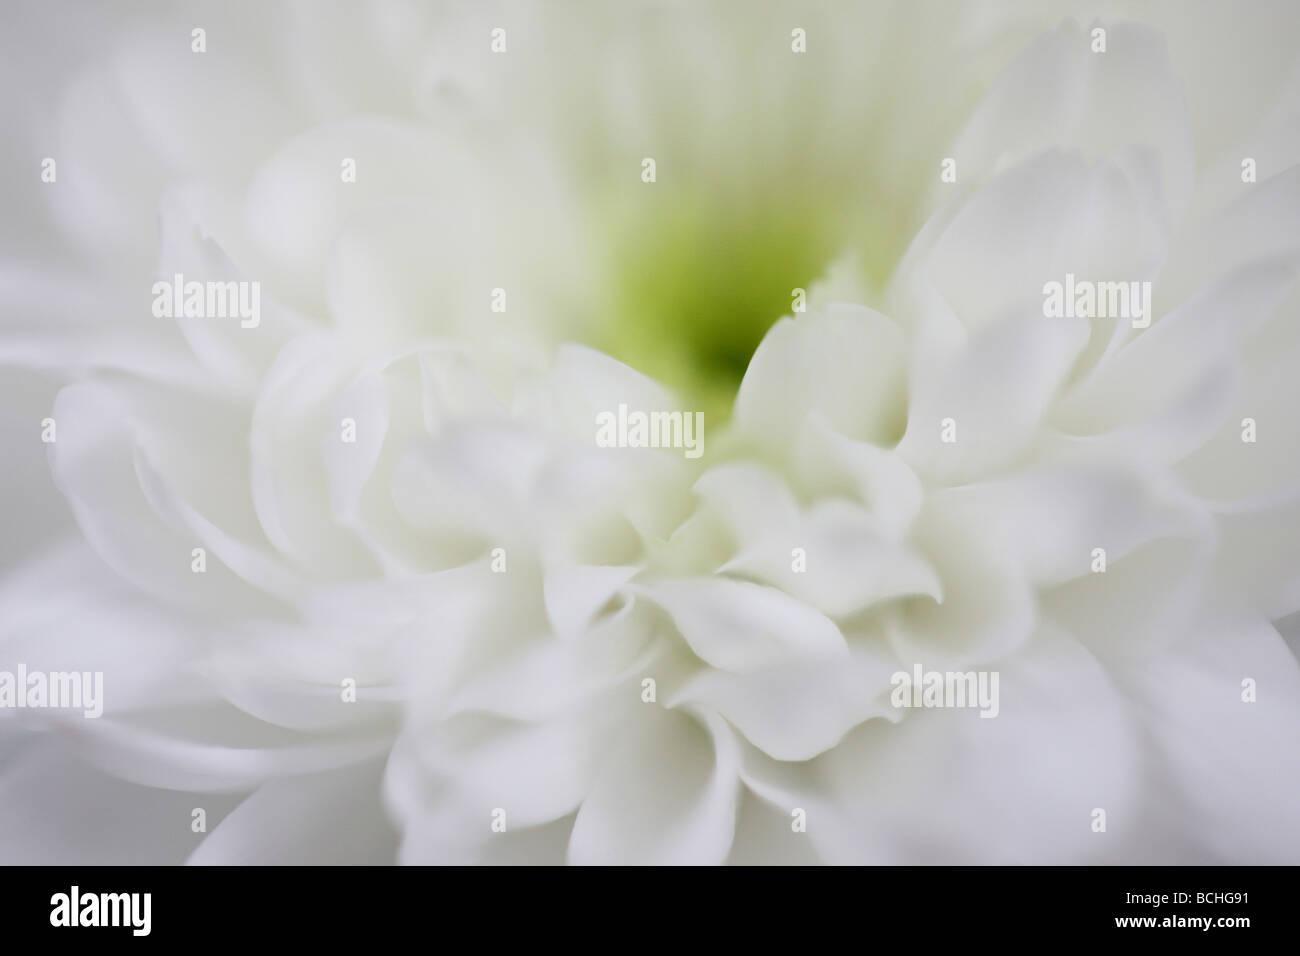 Femminile crisantemo bianco arte fotografia Jane Ann Butler JABP Fotografia414 Immagini Stock